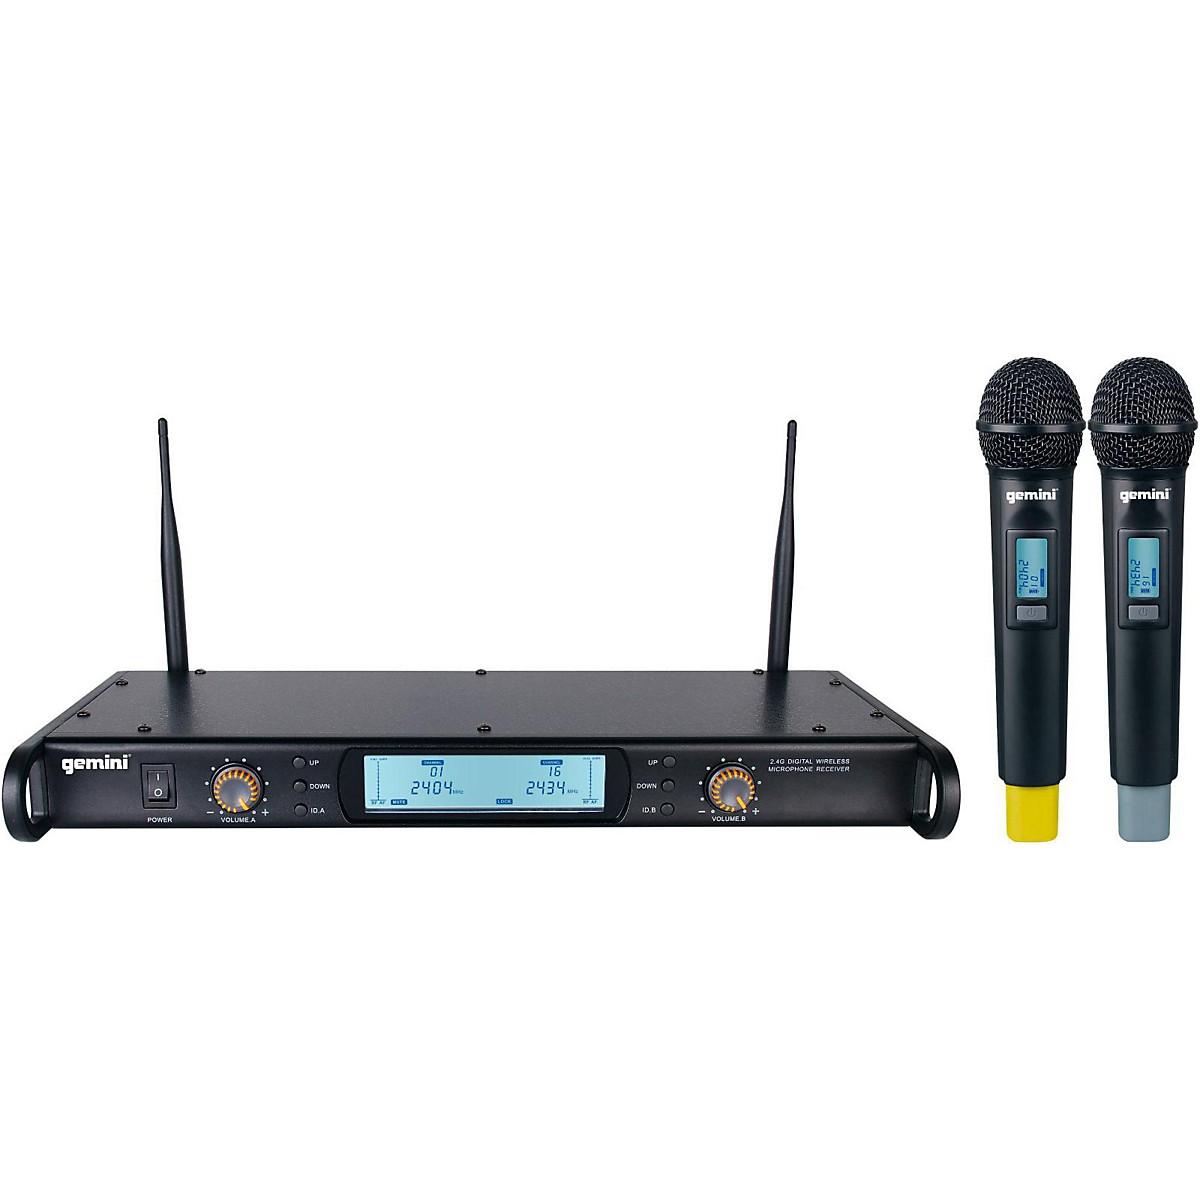 Gemini GDX-2000M Digital Wireless Dual Microphone System